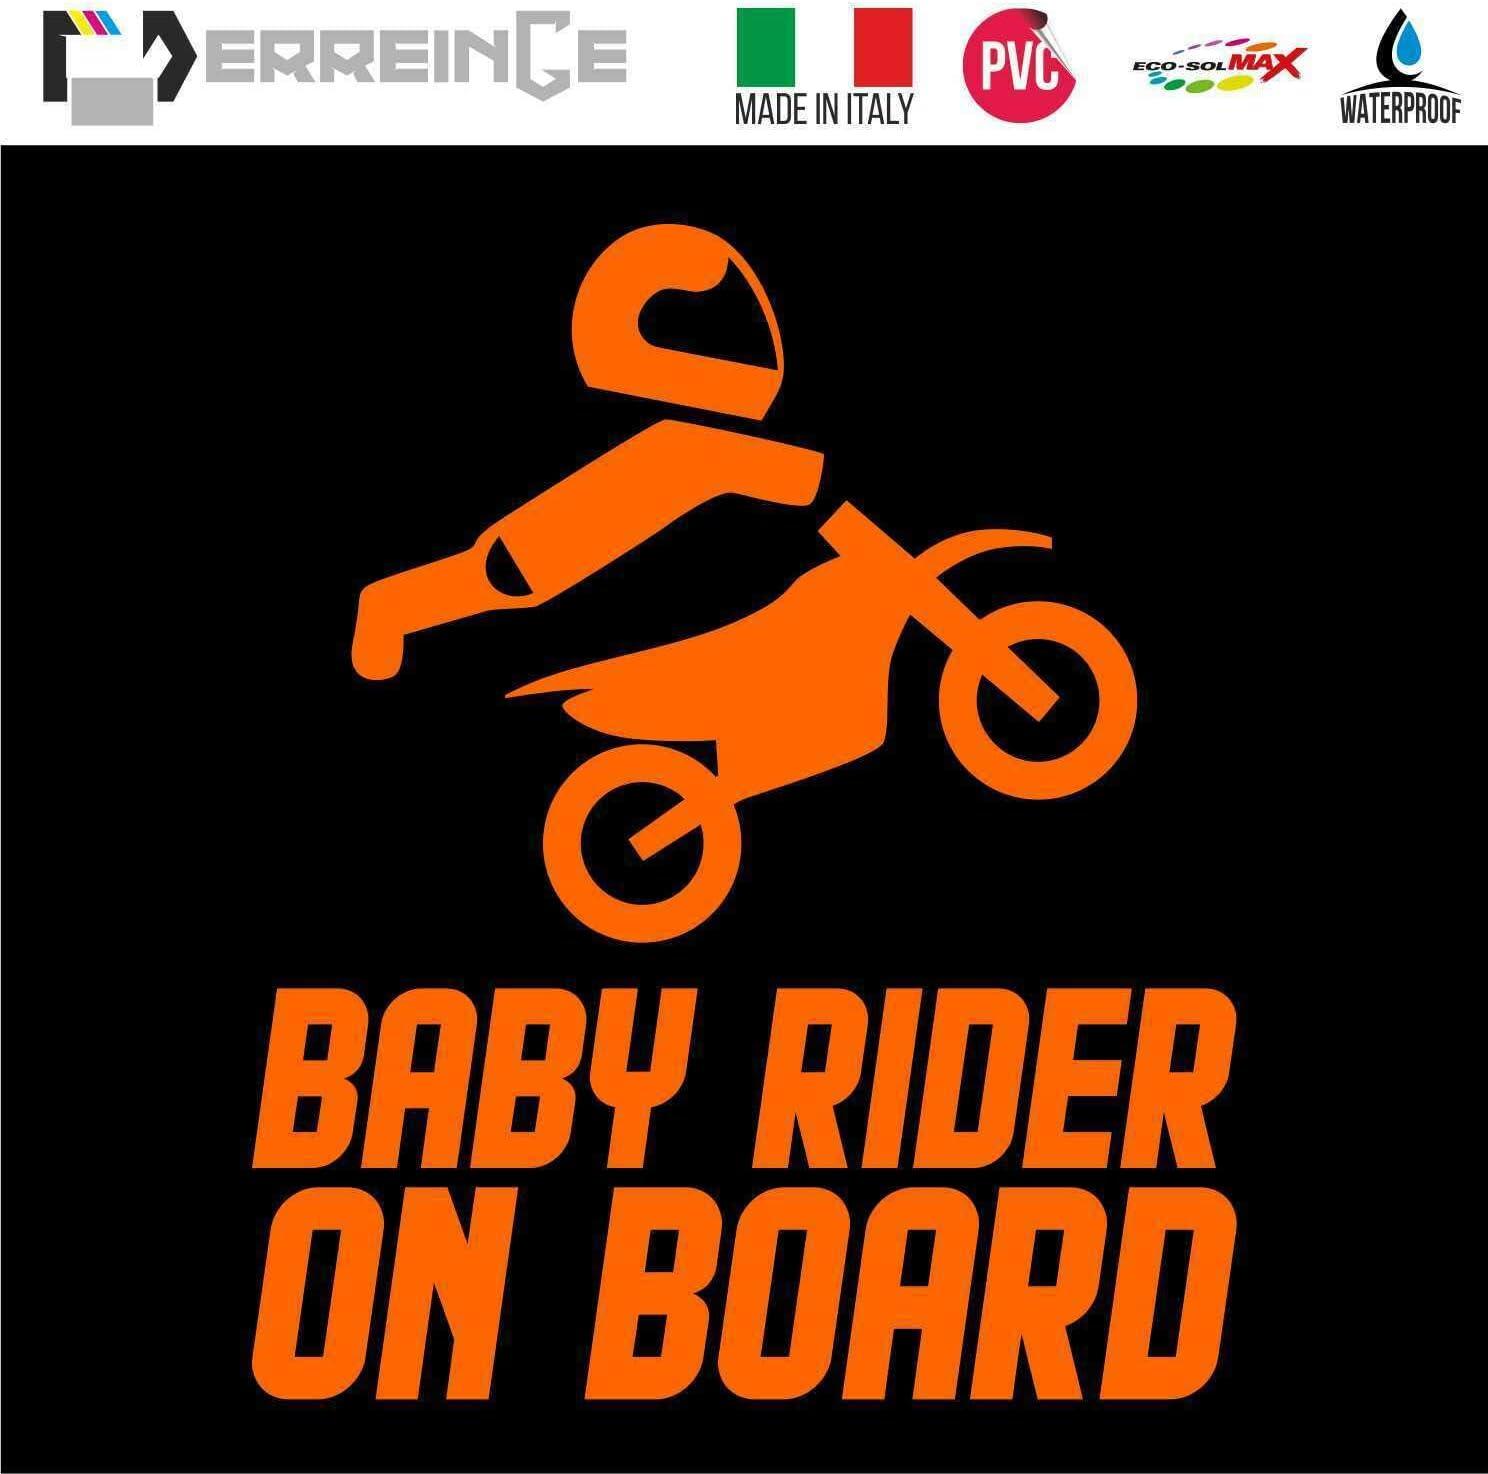 ERREINGE Sticker BABY RIDER ON BOARD ROSE ARGENT Autocollant pr/éd/écoup/é in PVC per Moto Motocross Scooter Bike Casco Vespa cm 15